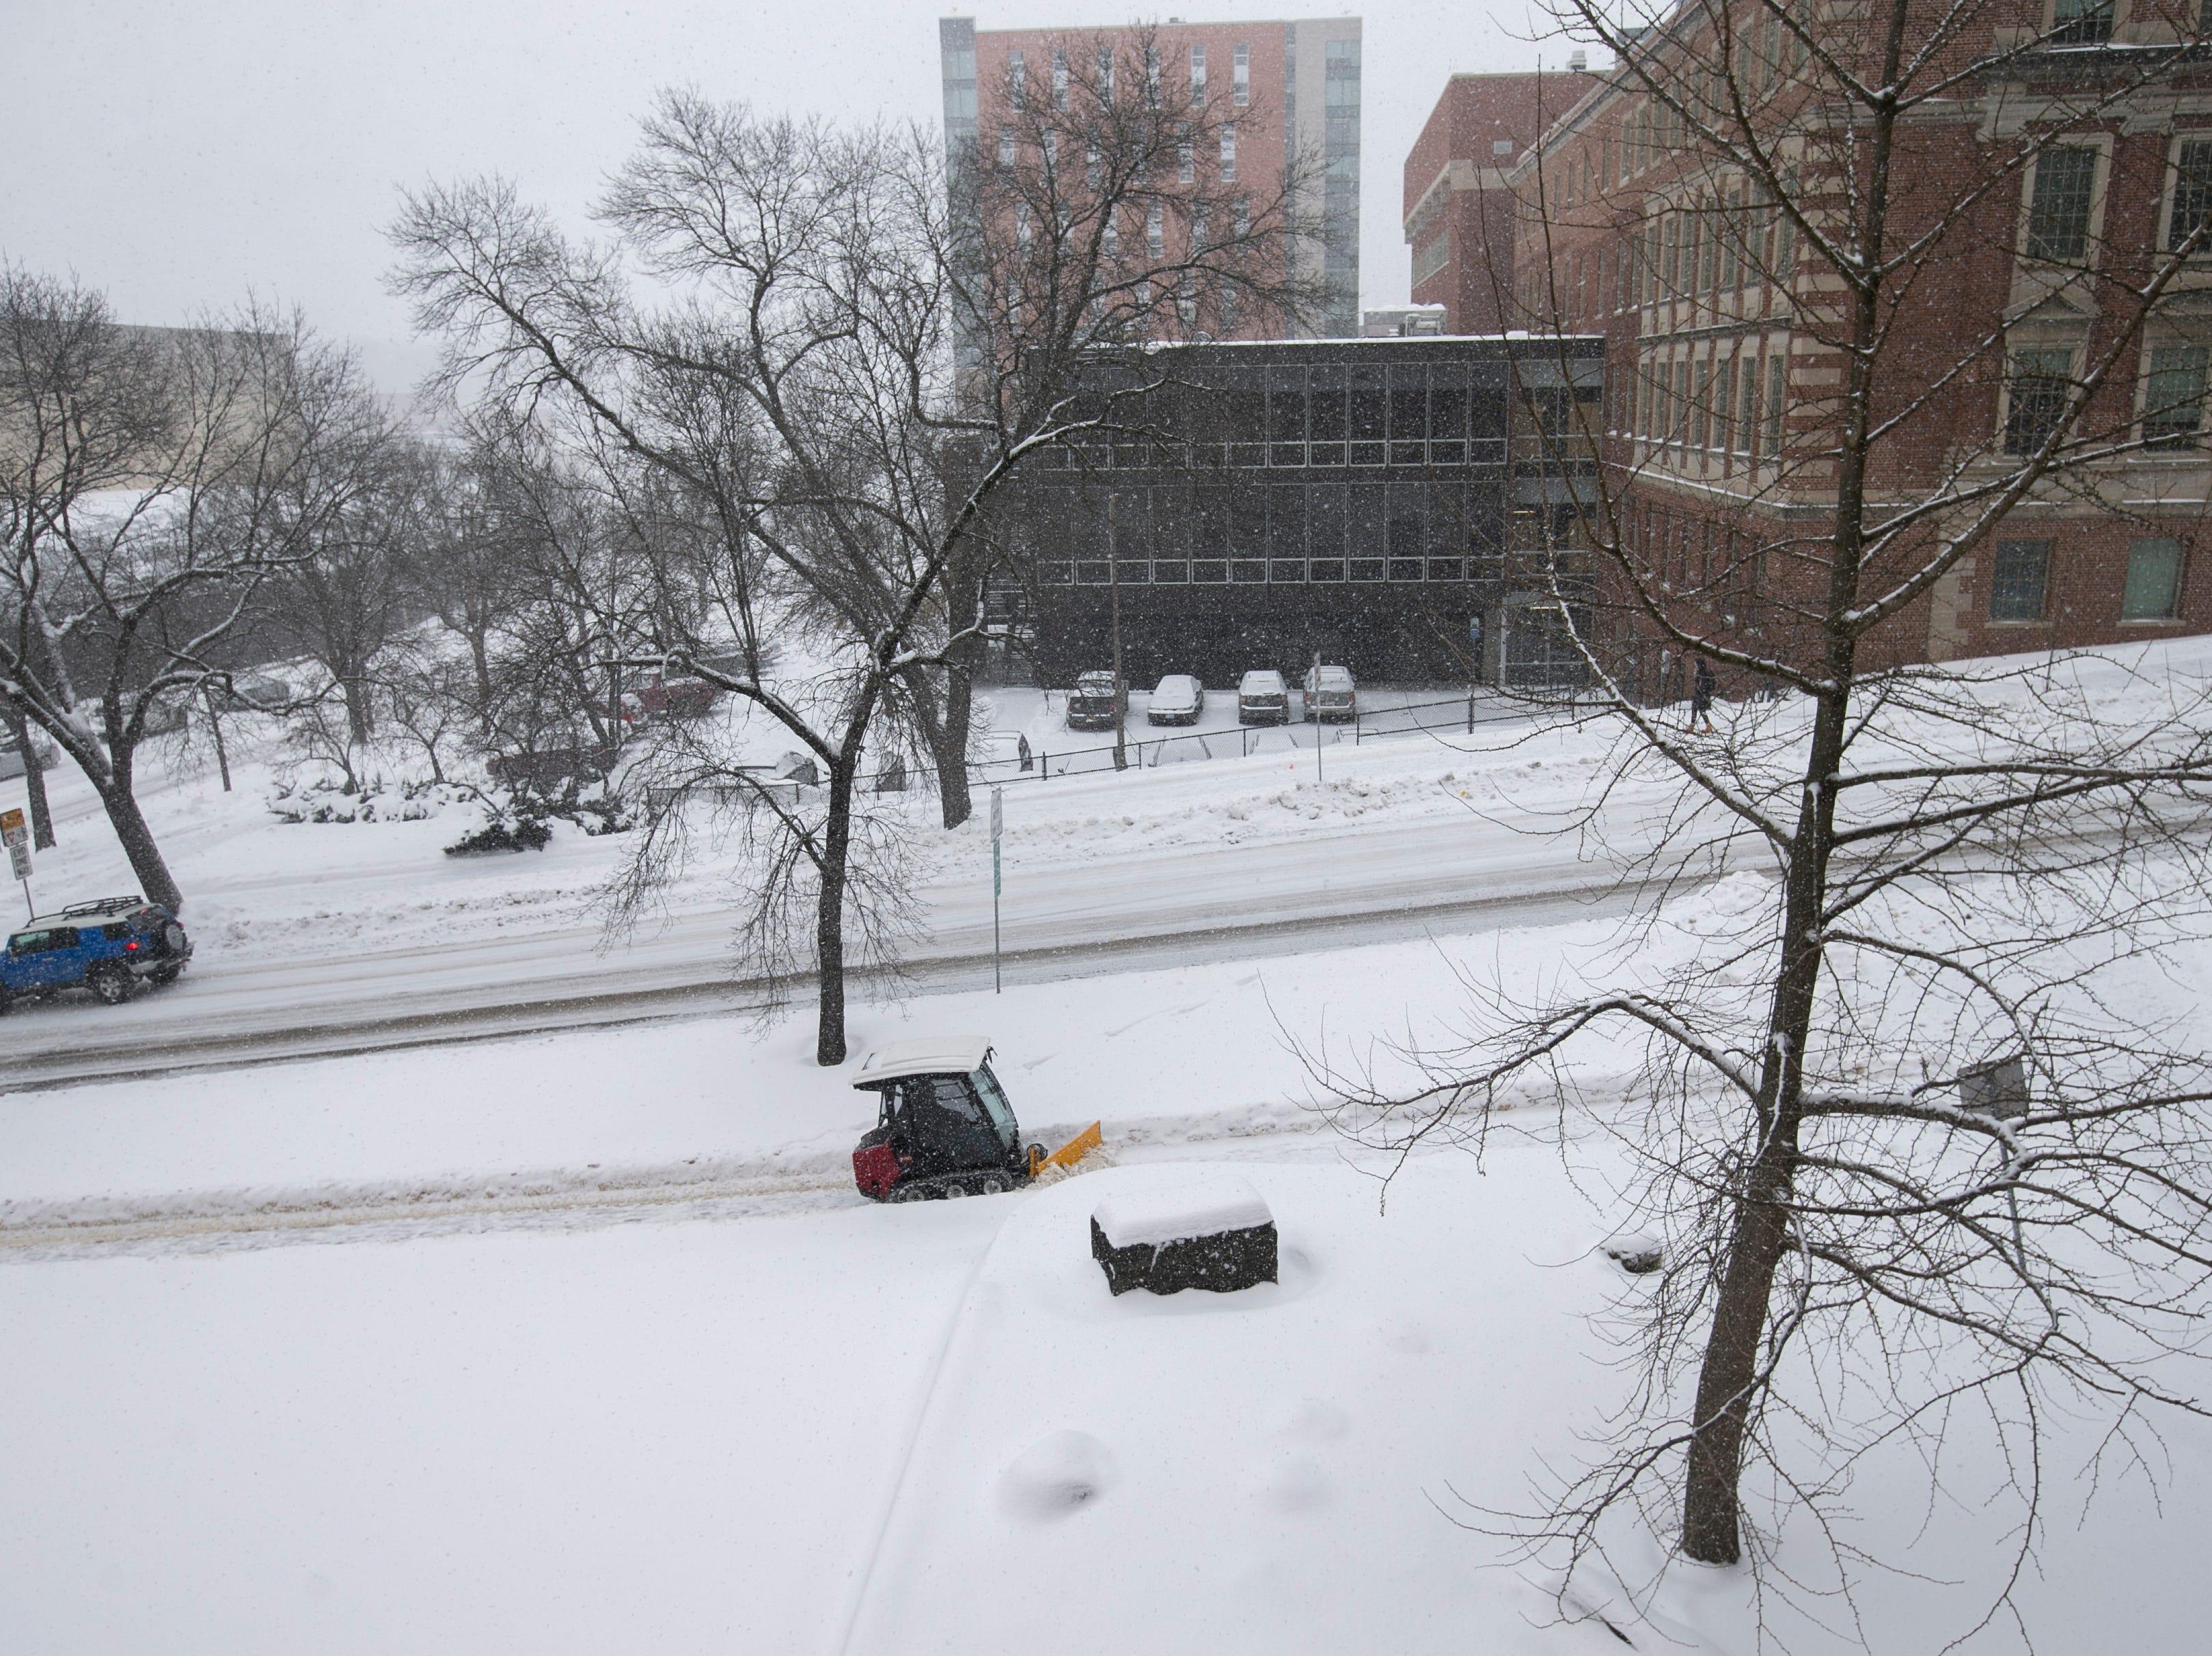 A small plow clears a sidewalk on Market Street as snow falls on Thursday, Jan. 31, 2019, in downtown Iowa City, Iowa.